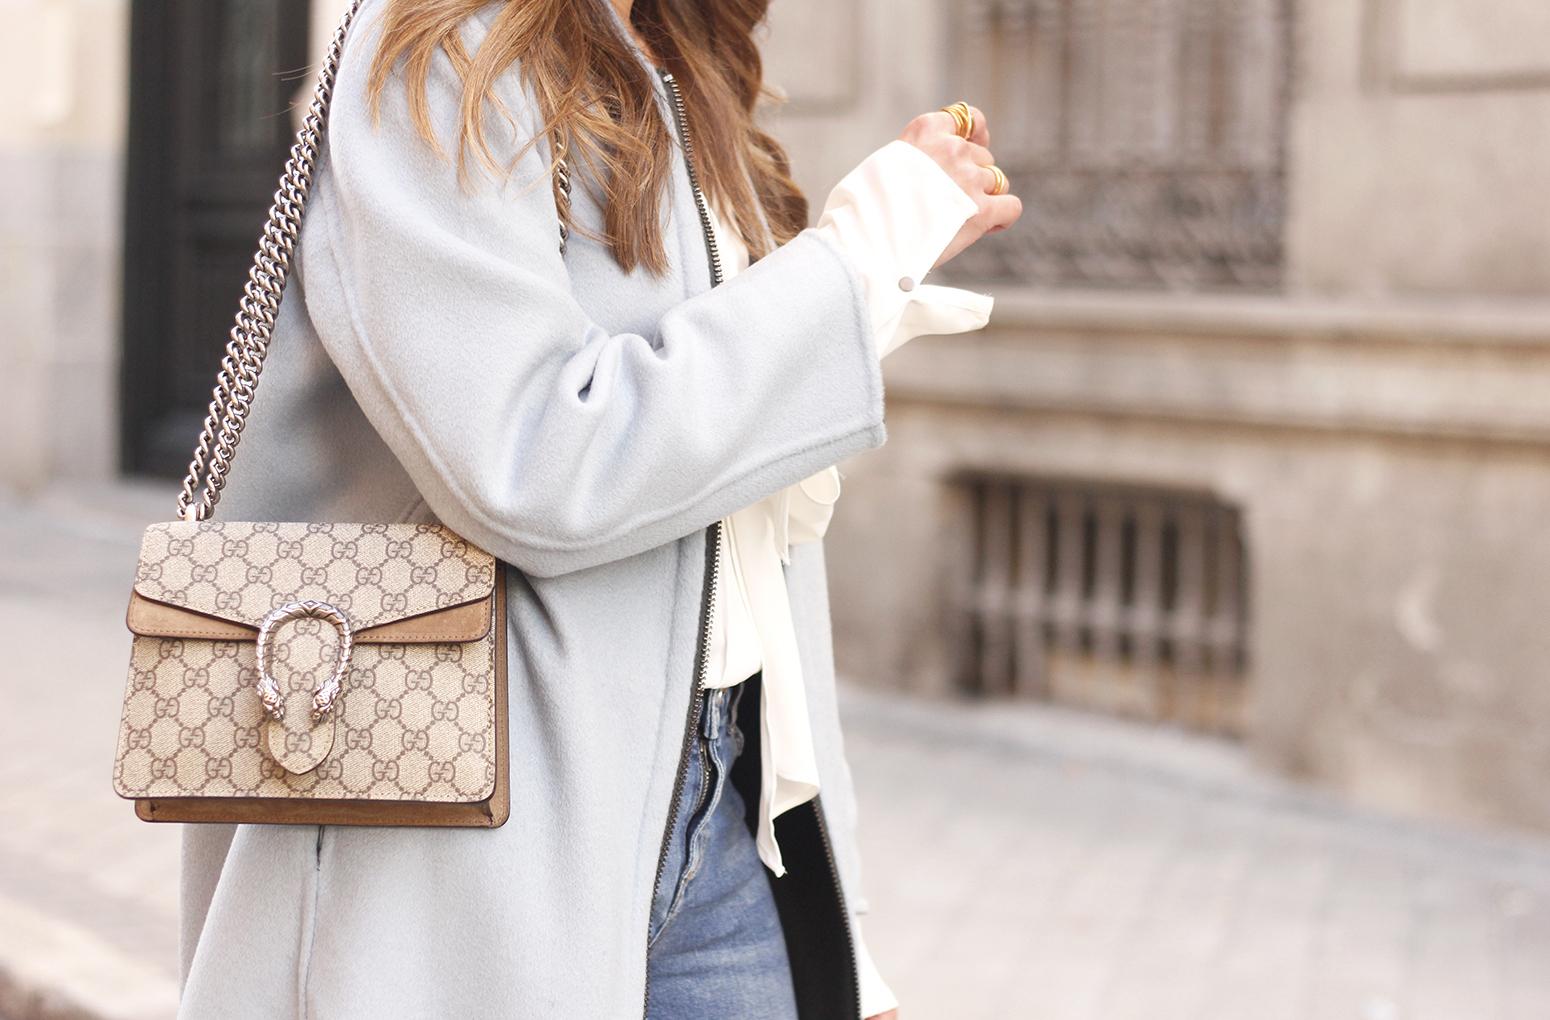 blue coat uterqüe abrigo azul gucci bag burgundy heels winter outfit street style fashion14